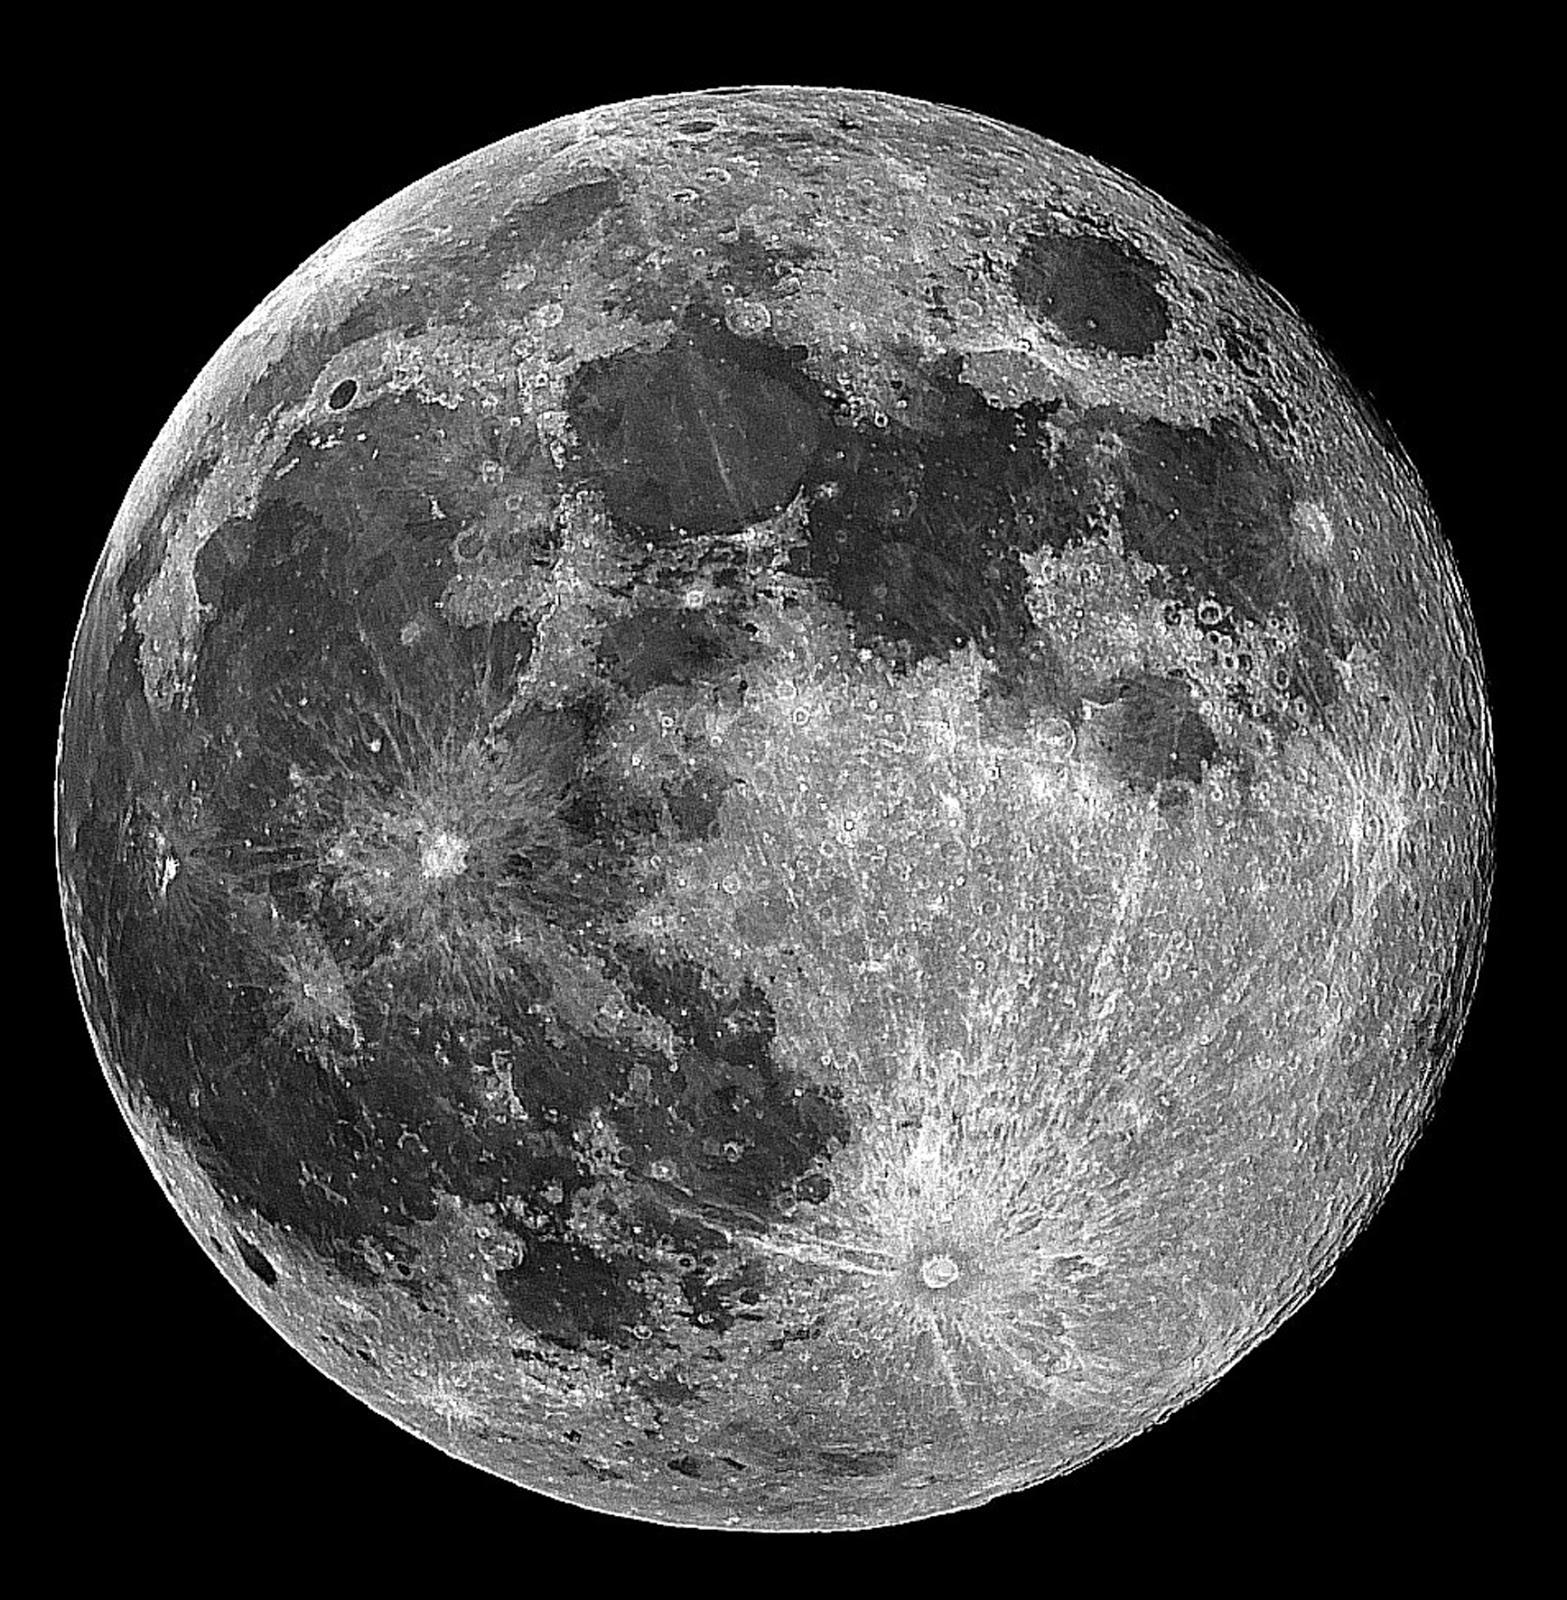 Charles frith punk planning the moon up close dp 1020 - Moon close up ...